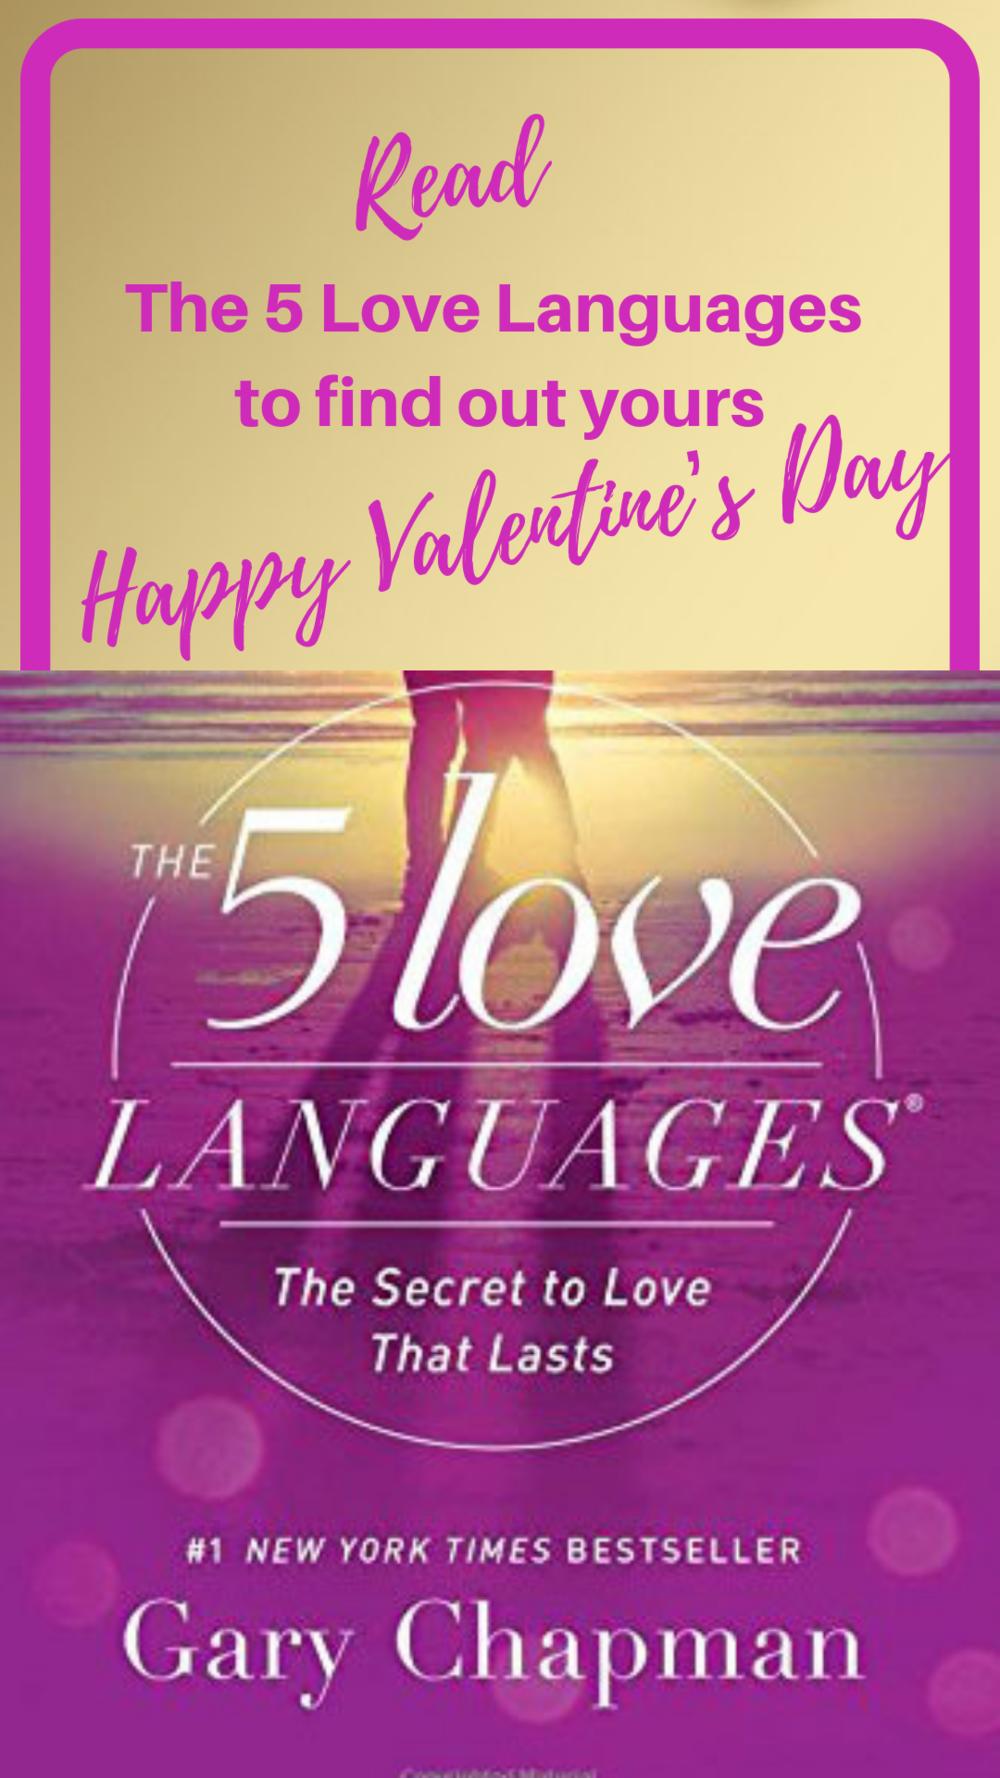 #audiobook #bookrecommendation #relationshipadvice